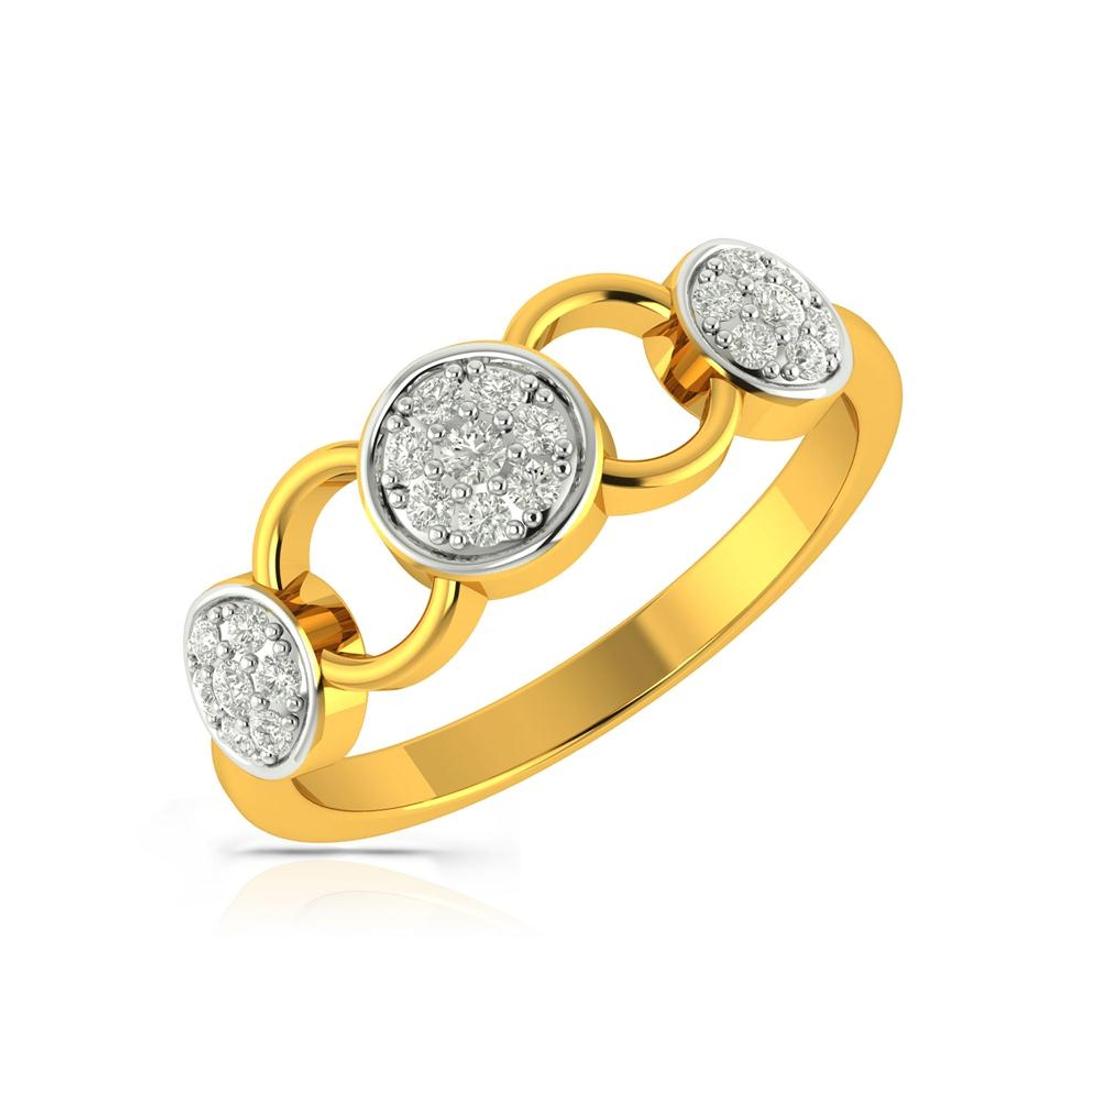 Buy Charu Jewels Diamond Ladies Ring CJLR0449 Online in India